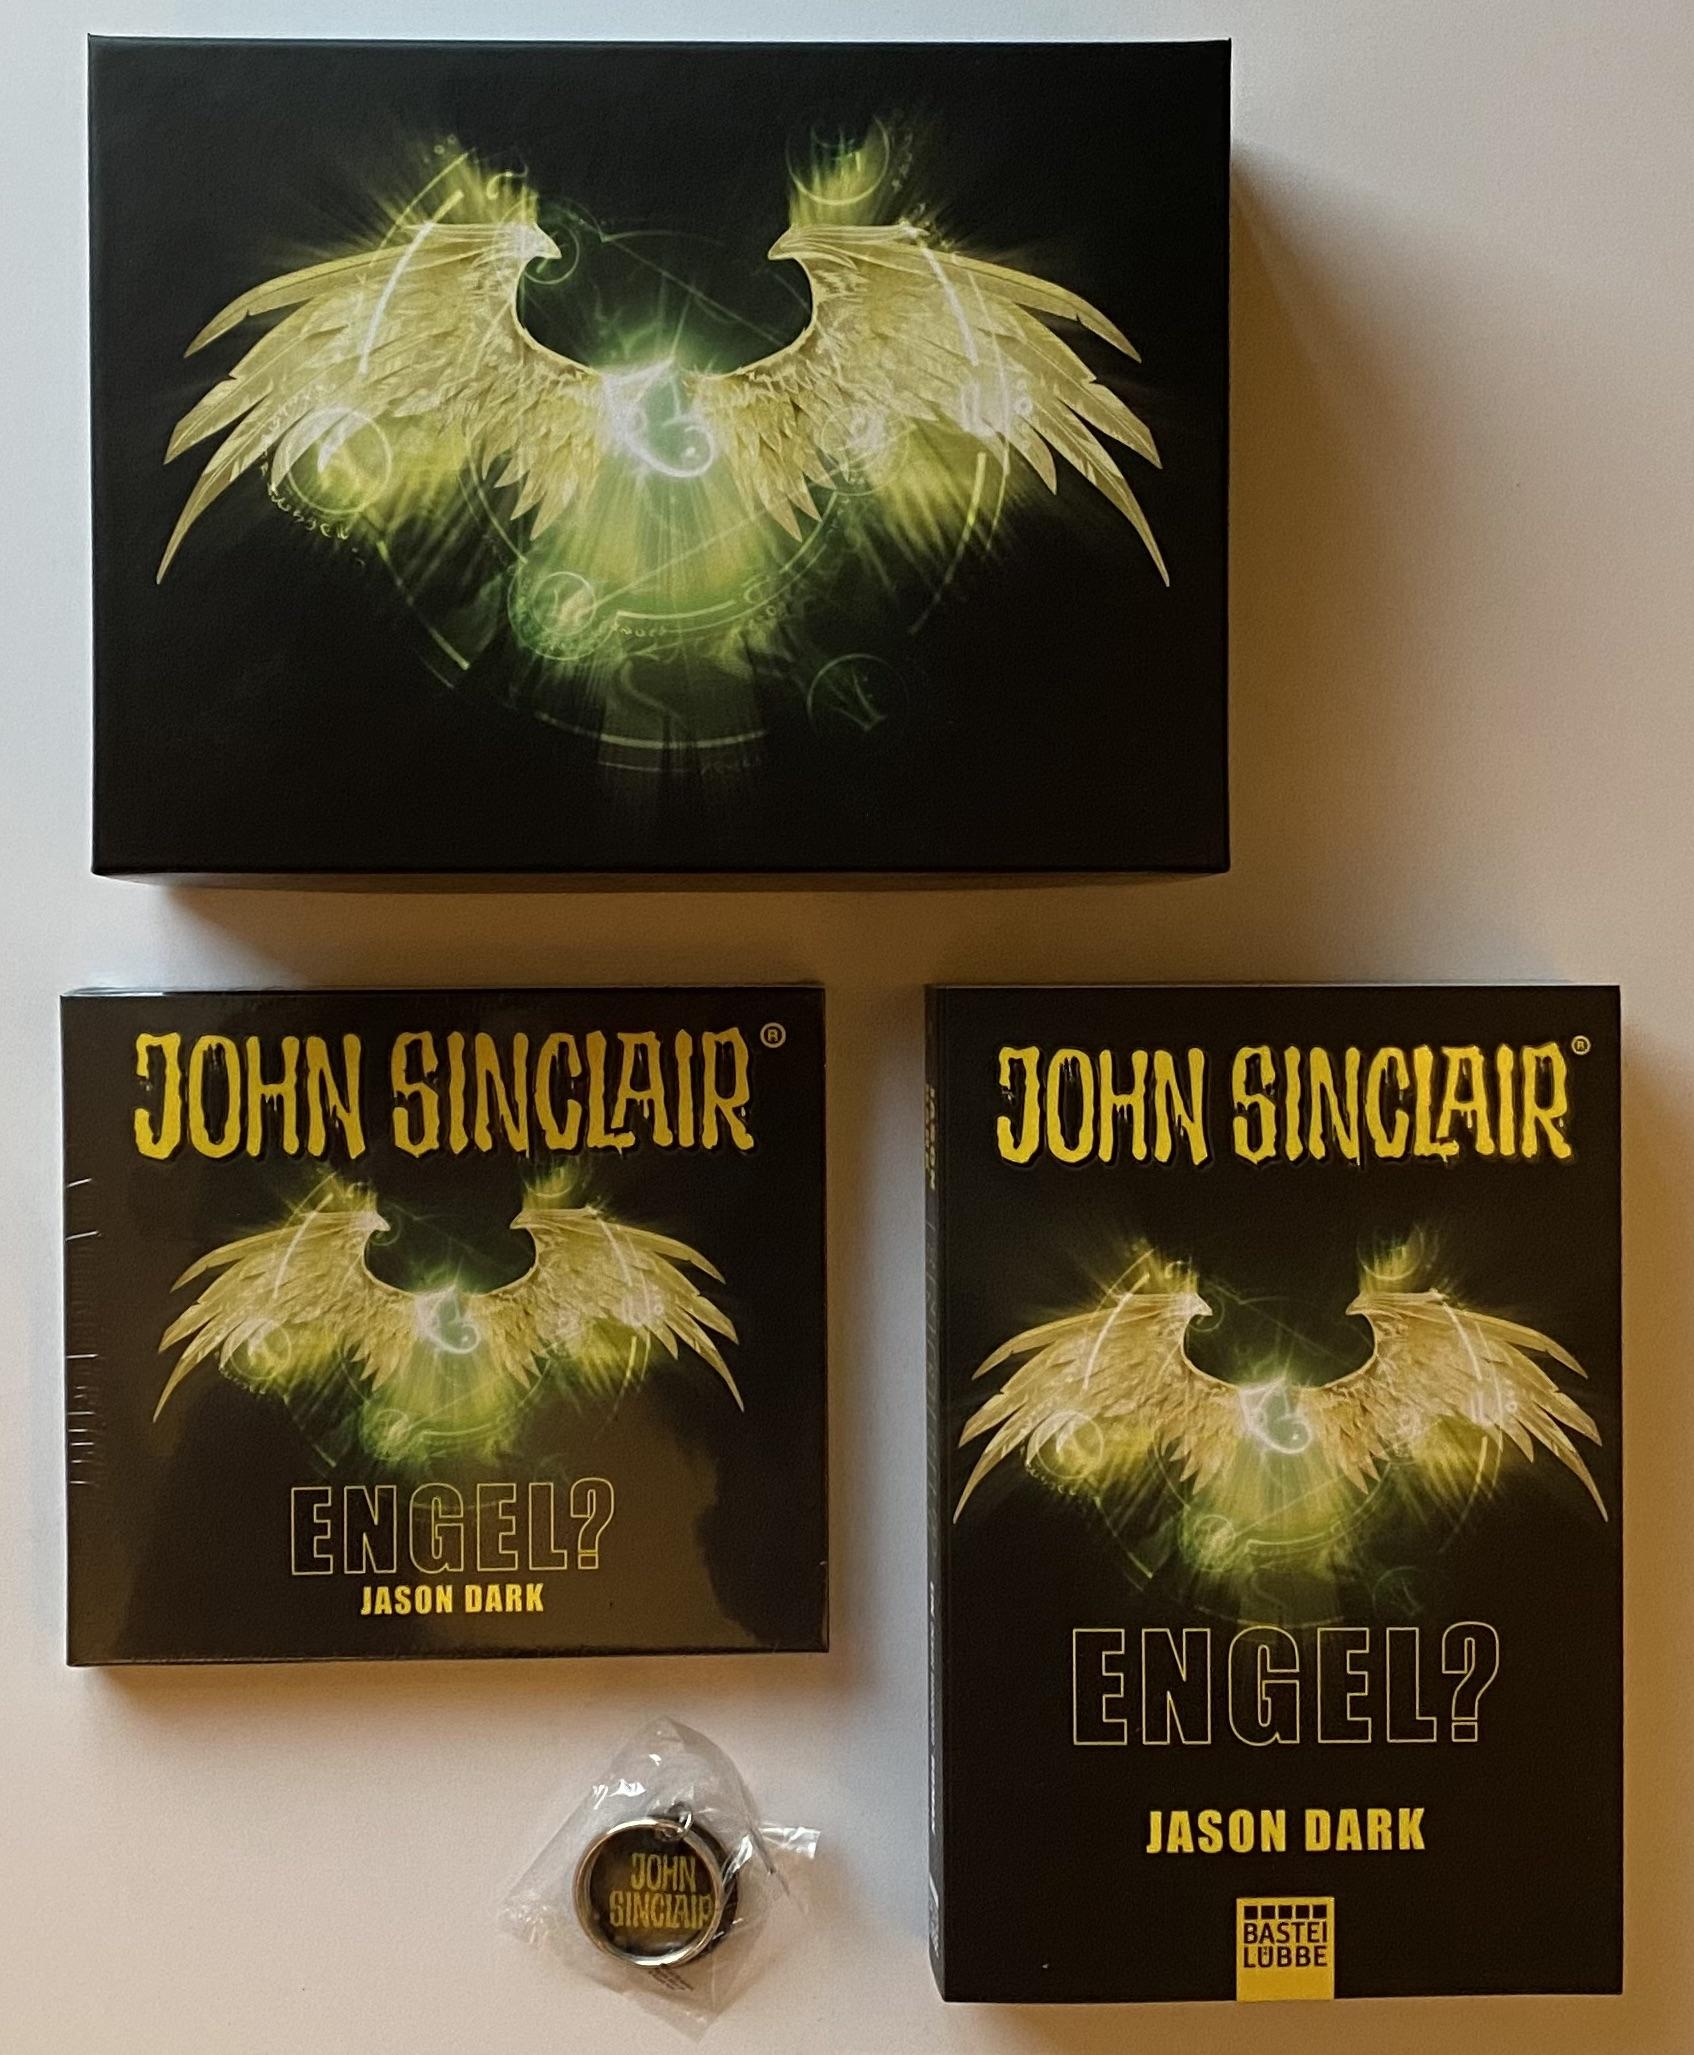 John_Sinclair_Engel?_Ltd_Retroport_01